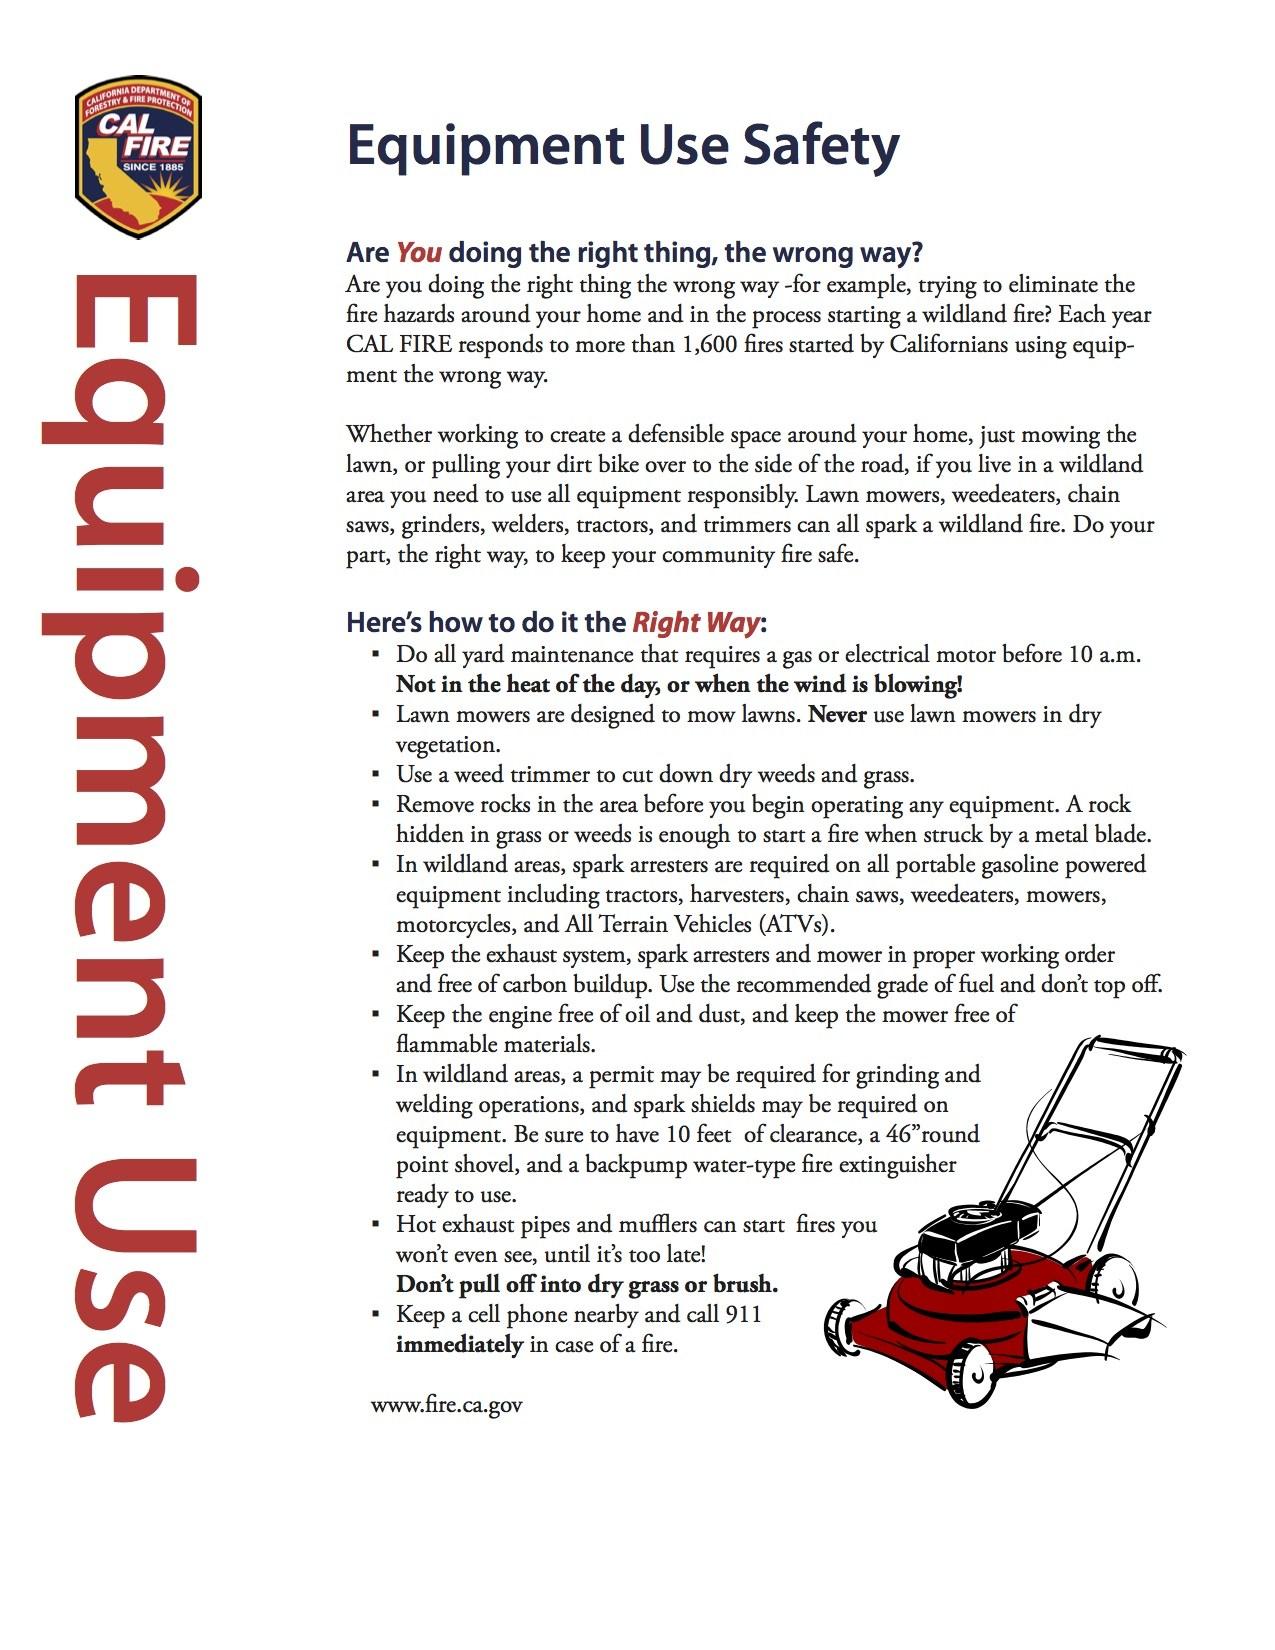 CalFire Equipment-Use.jpg